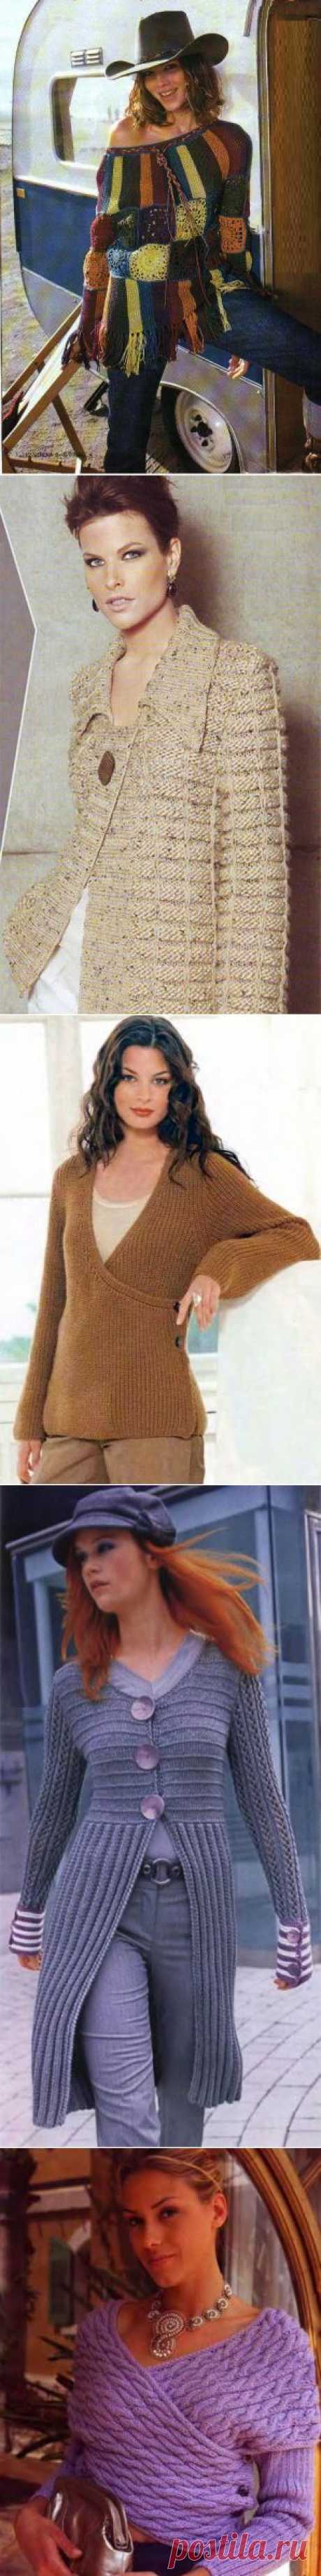 yarn, video, knitting lessons, knitting, spokes, hooks, needlework, Myhobby.kz, Models for knitting, Pullovers, jackets. Part III